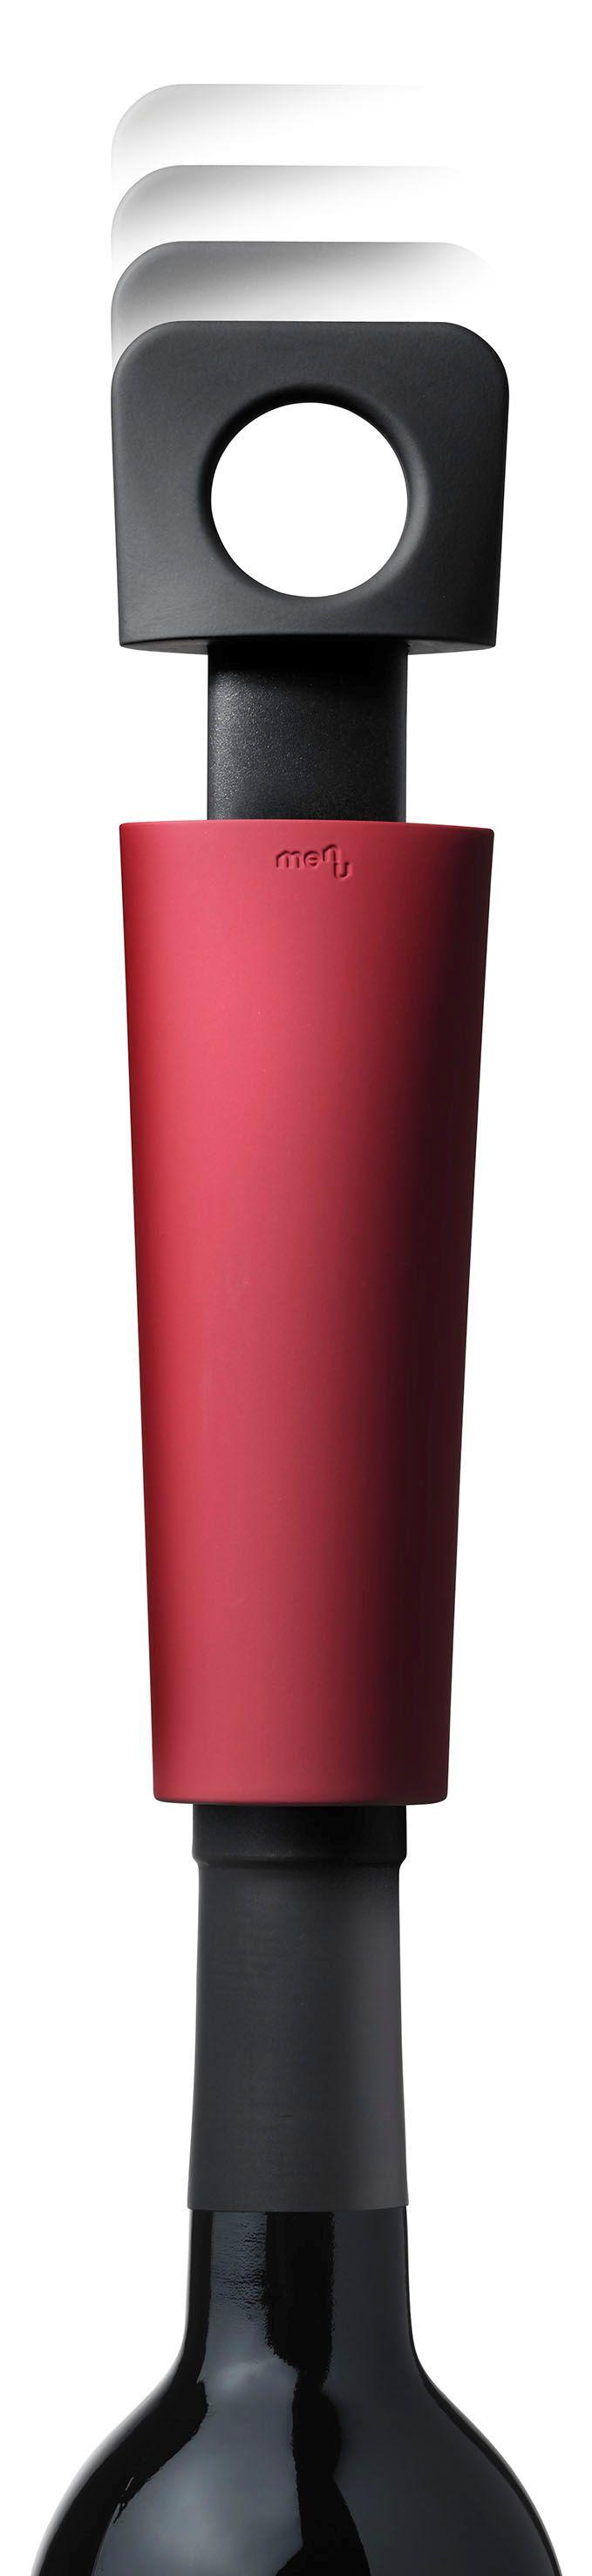 Blade Vacuum Pump, Red